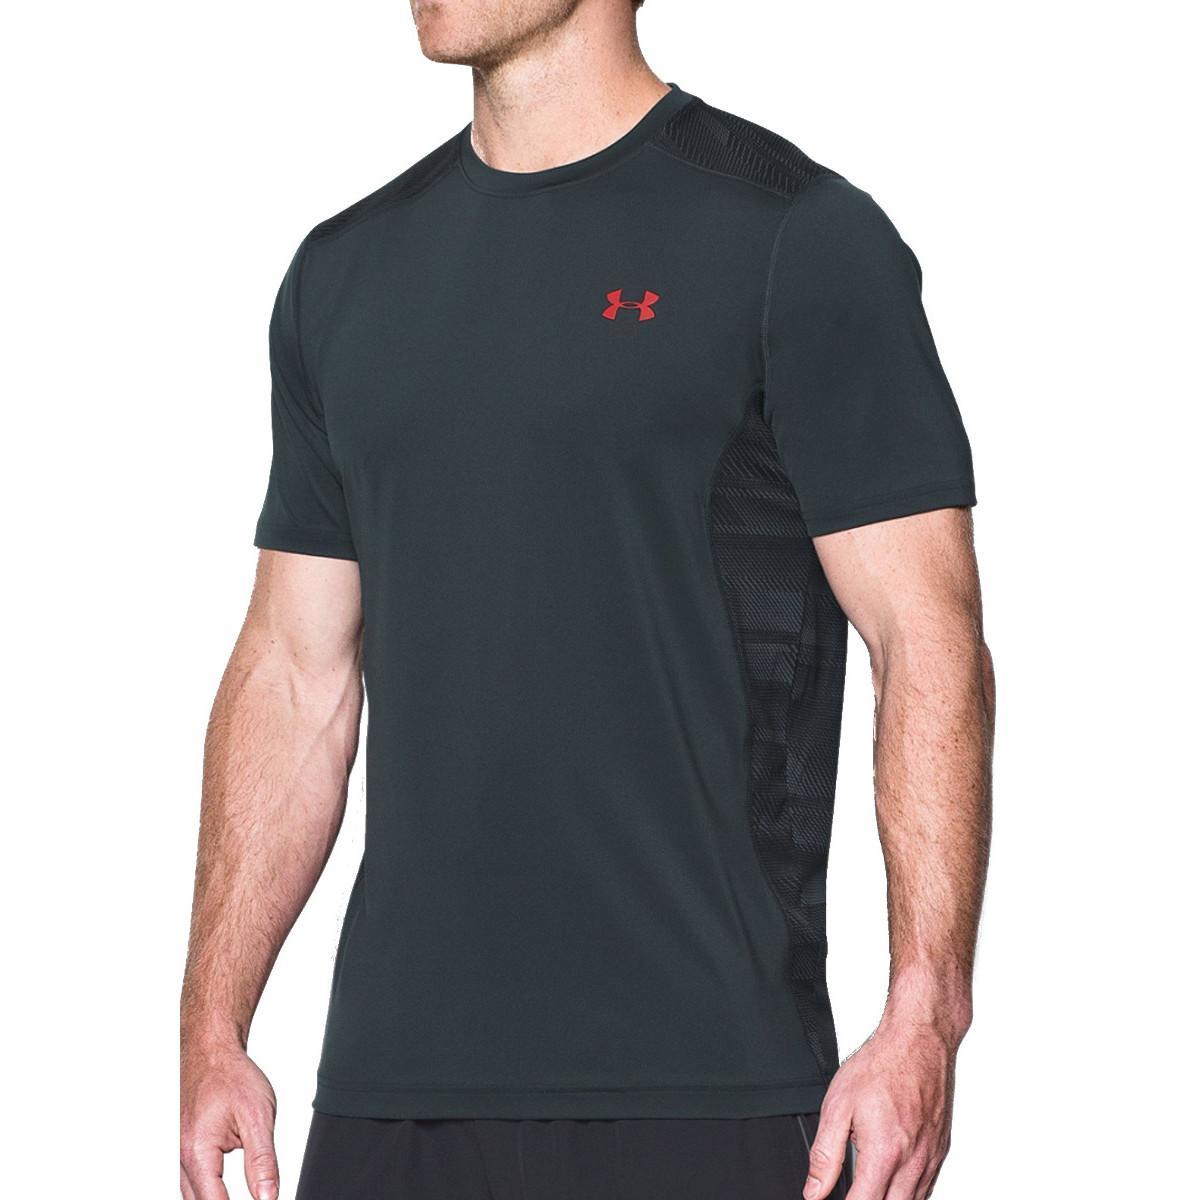 f8d4d34485 Latest Under Armour Men'S Sports Shirts Products | Enjoy Huge ...